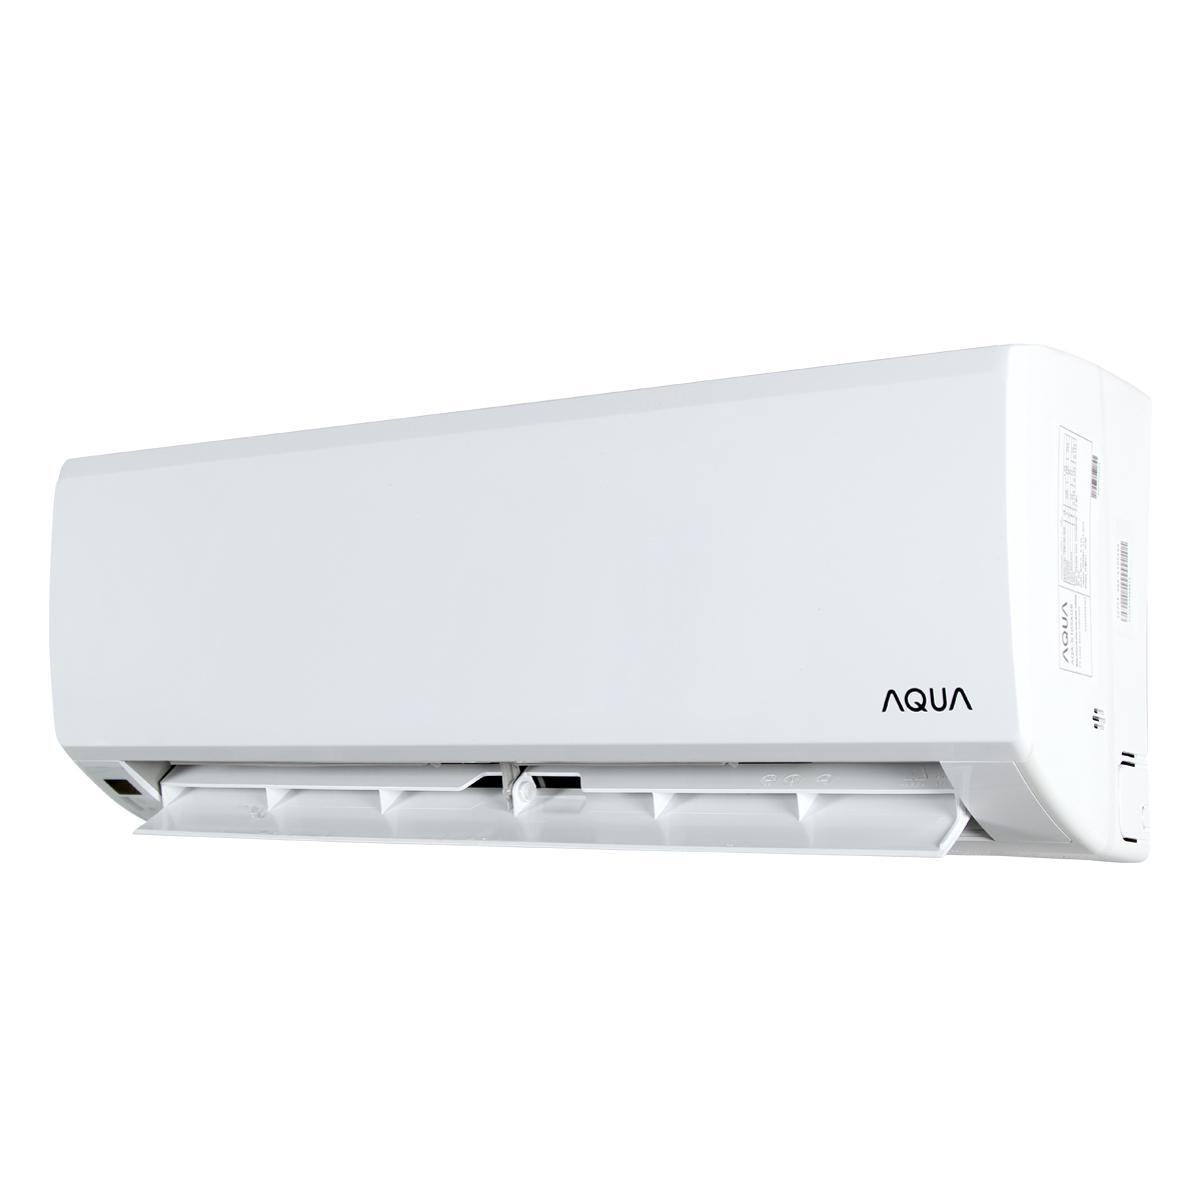 Belanja Murah Aqua Aqakc105ag6 Ac Air Conditioner 1 2 Pk Khusus Sharp Jetstream Plasmacluster Series 05pk